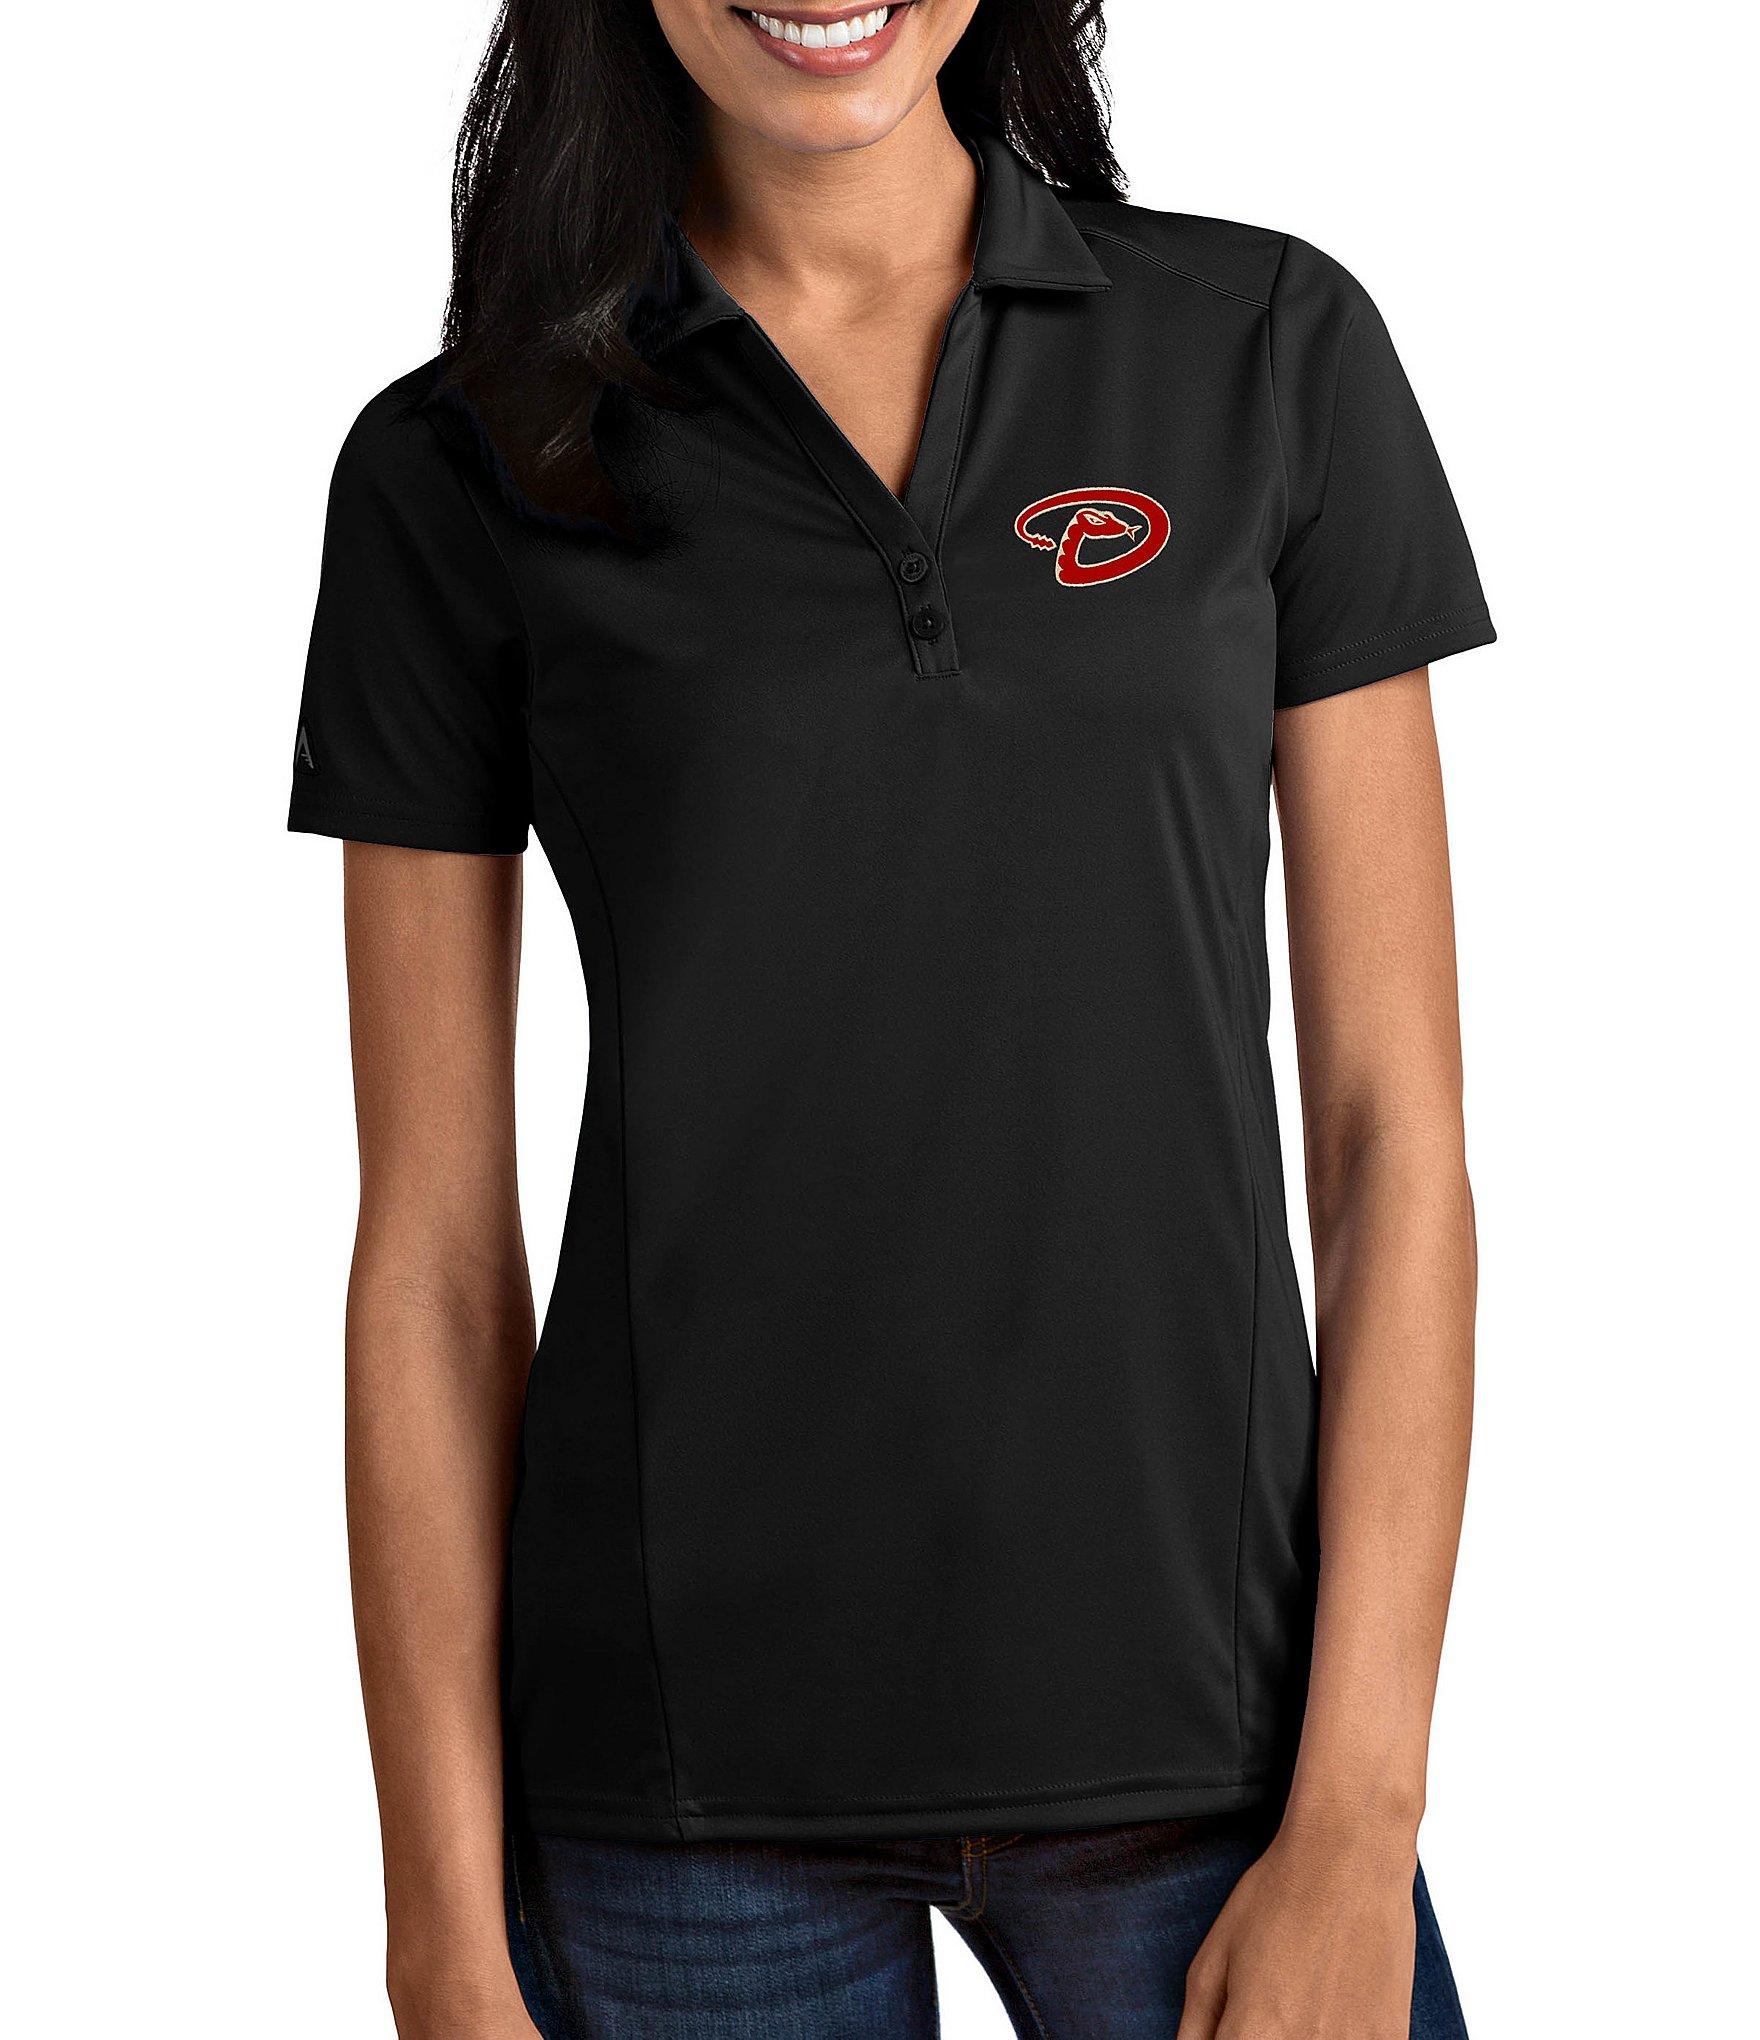 98eddc1ac2f5b Antigua Women's Activewear & Workout Apparel | Dillard's